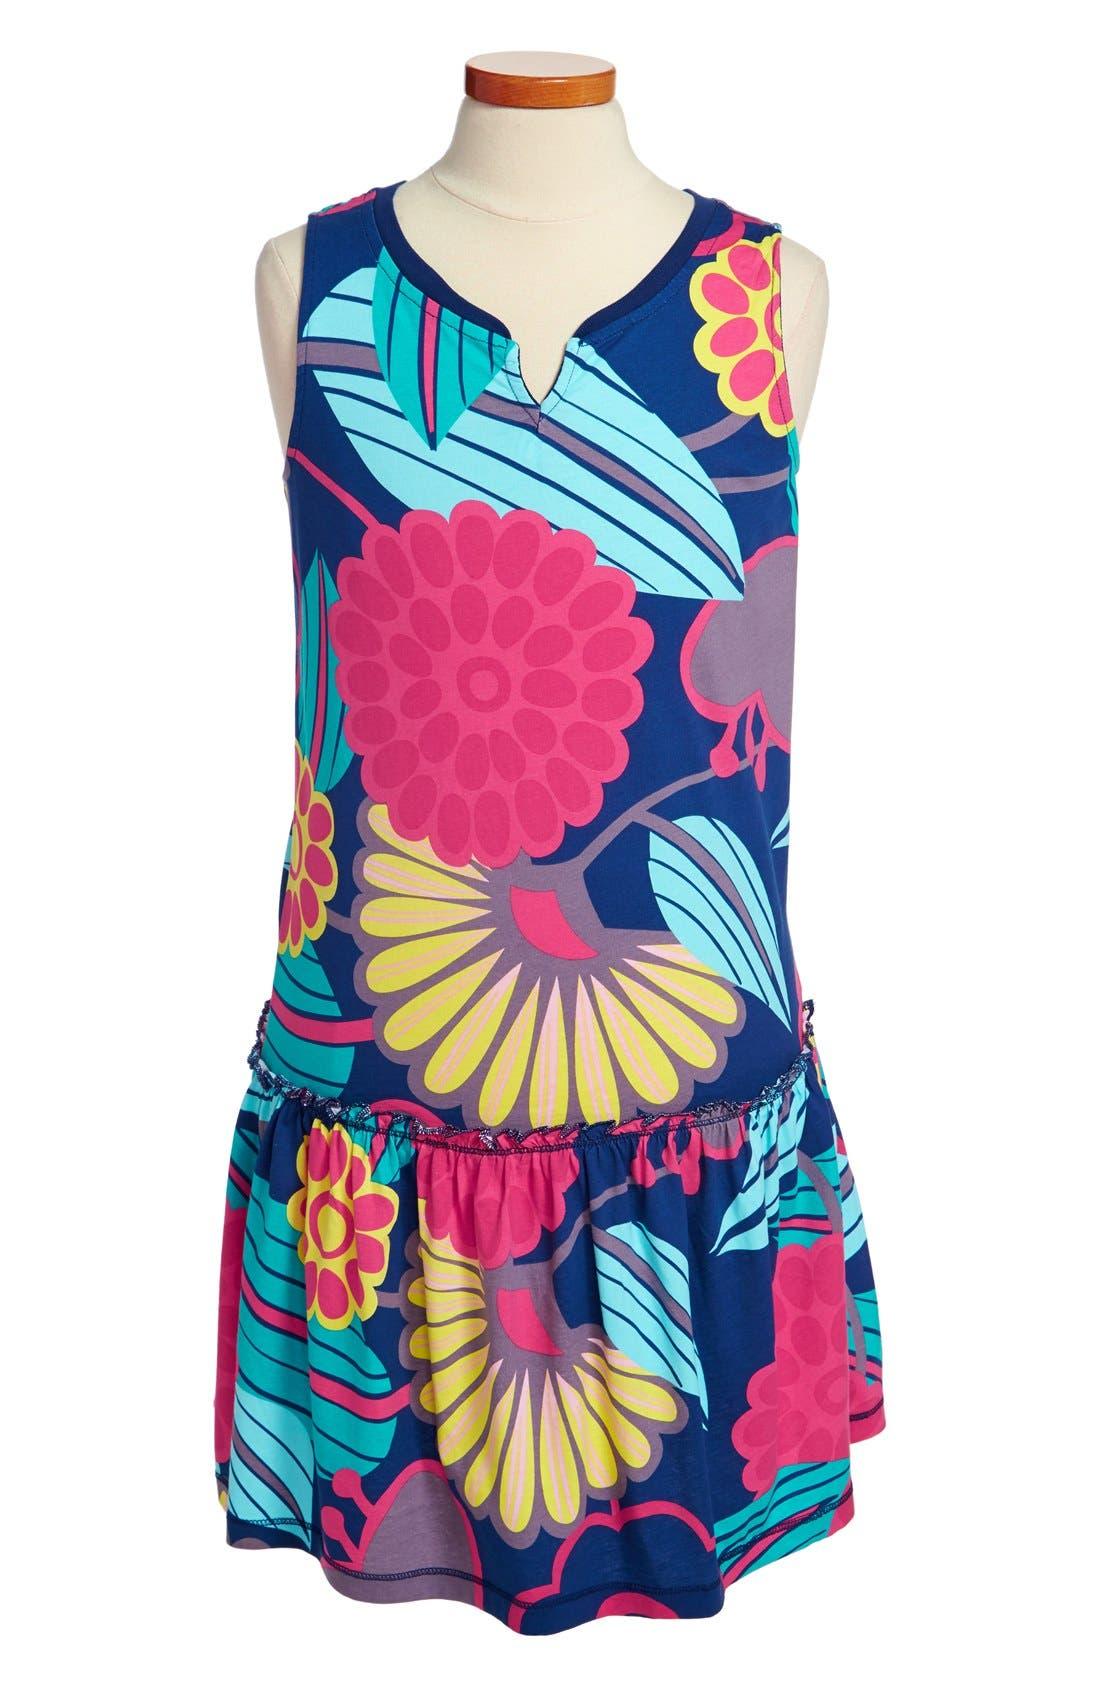 Main Image - Tea Collection 'Mod Gypsy' Print Dress (Toddler Girls, Little Girls & Big Girls)